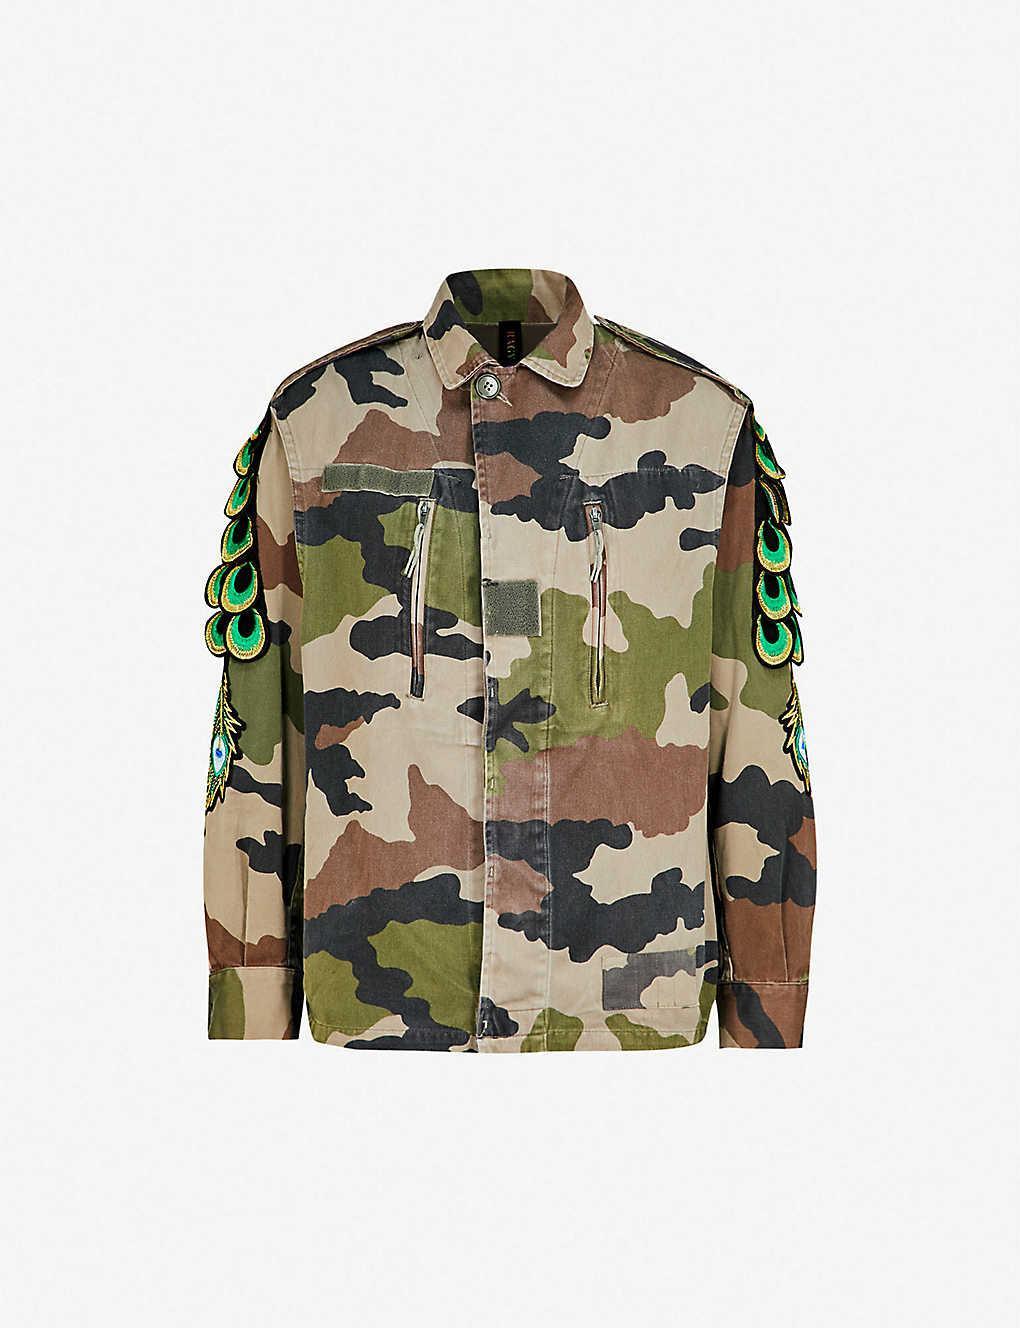 318ad64701ba1 RAGYARD - Camouflage-print peacock cotton jacket | Selfridges.com